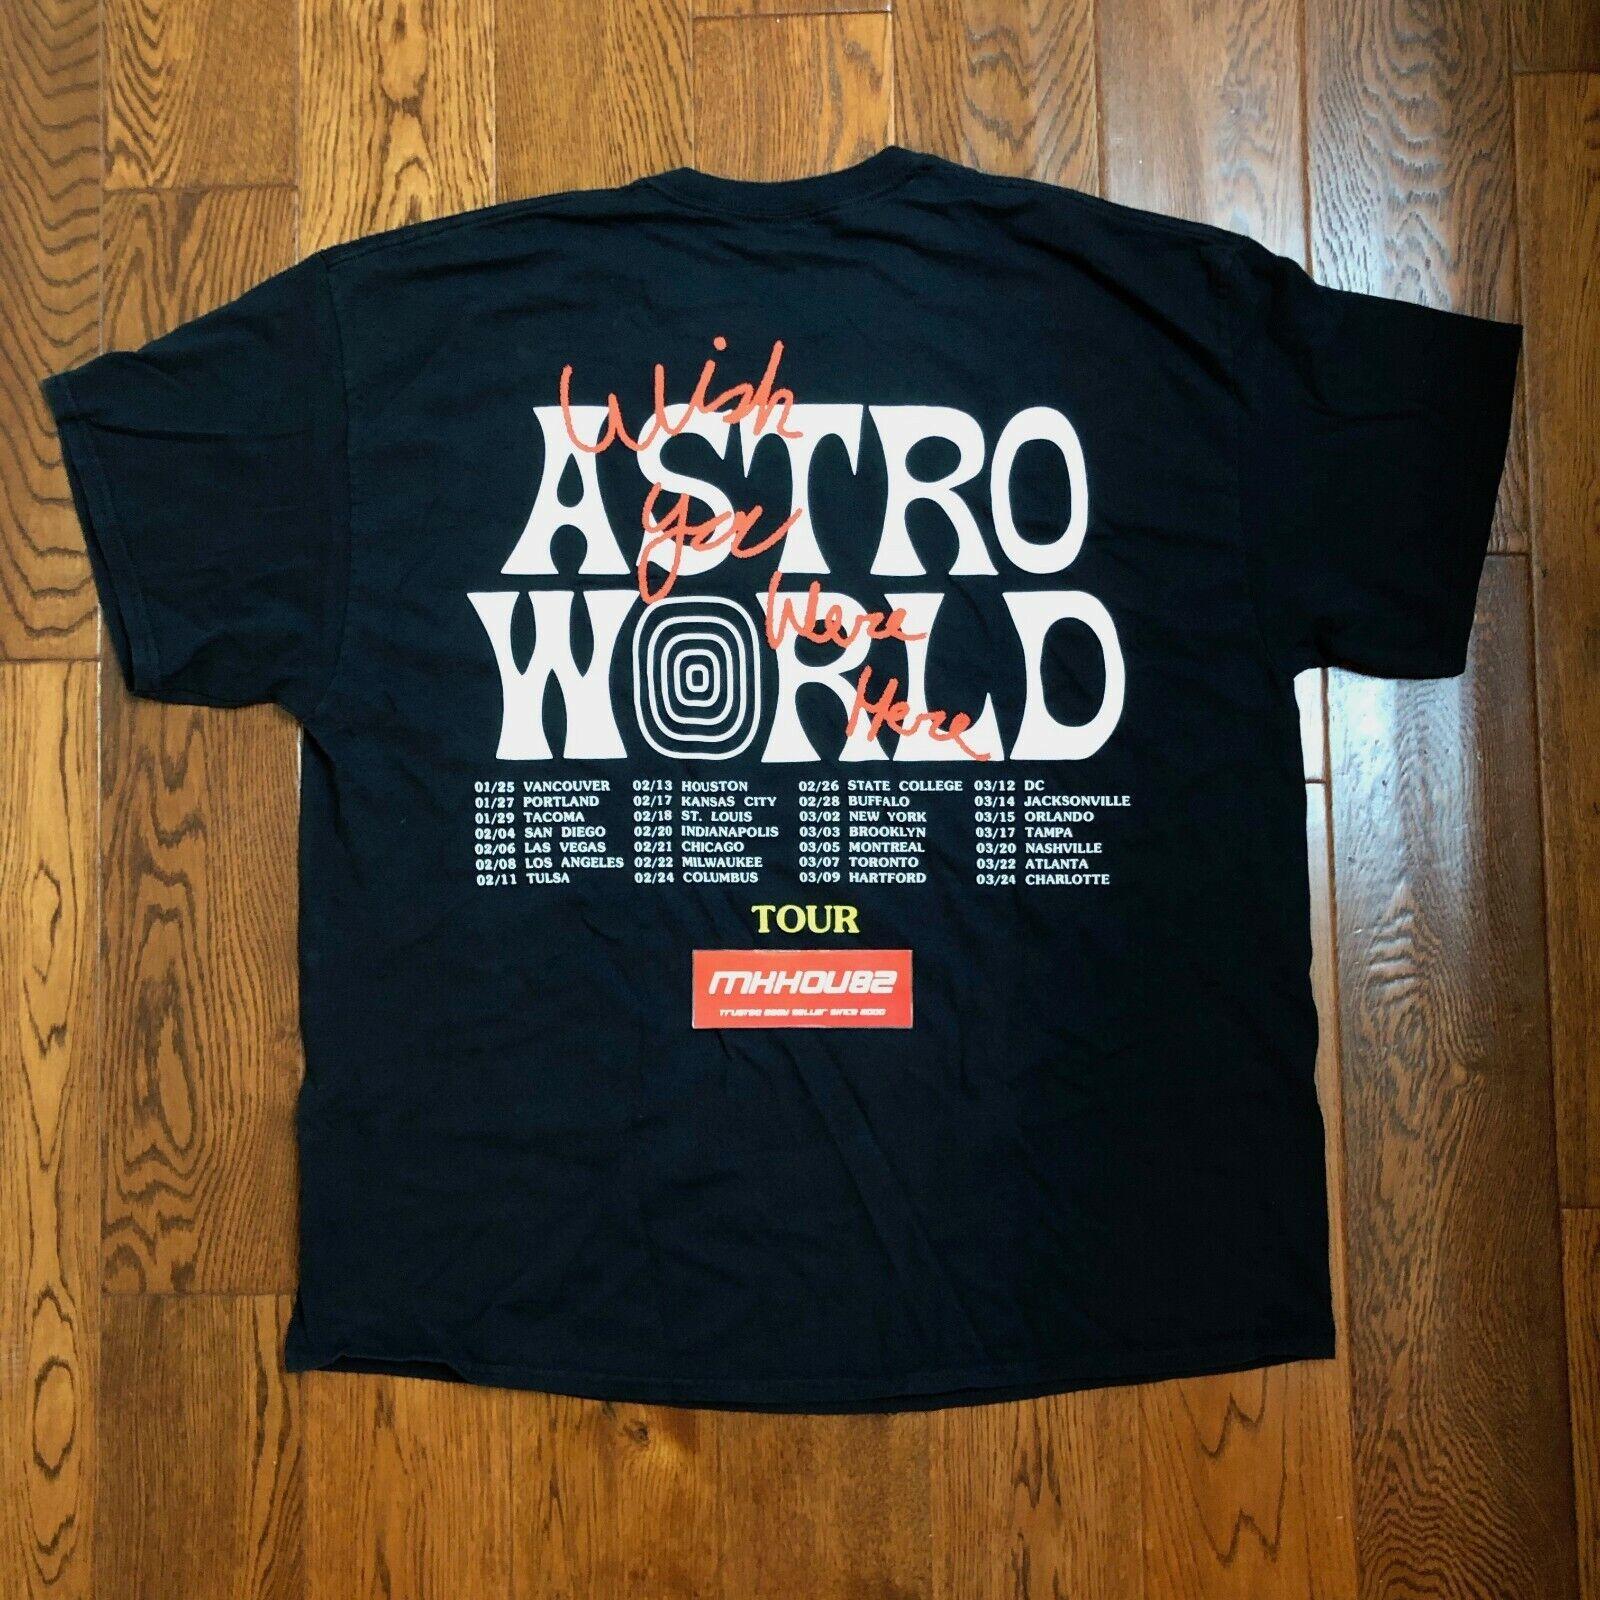 6ae9f313132f New Travis Scott Astroworld Wish You Were Here Tour Merch Tee T-Shirt 2019  Sz. Vintage Guess USA Small Striped Short Sleeve Shirt Men's Size XL